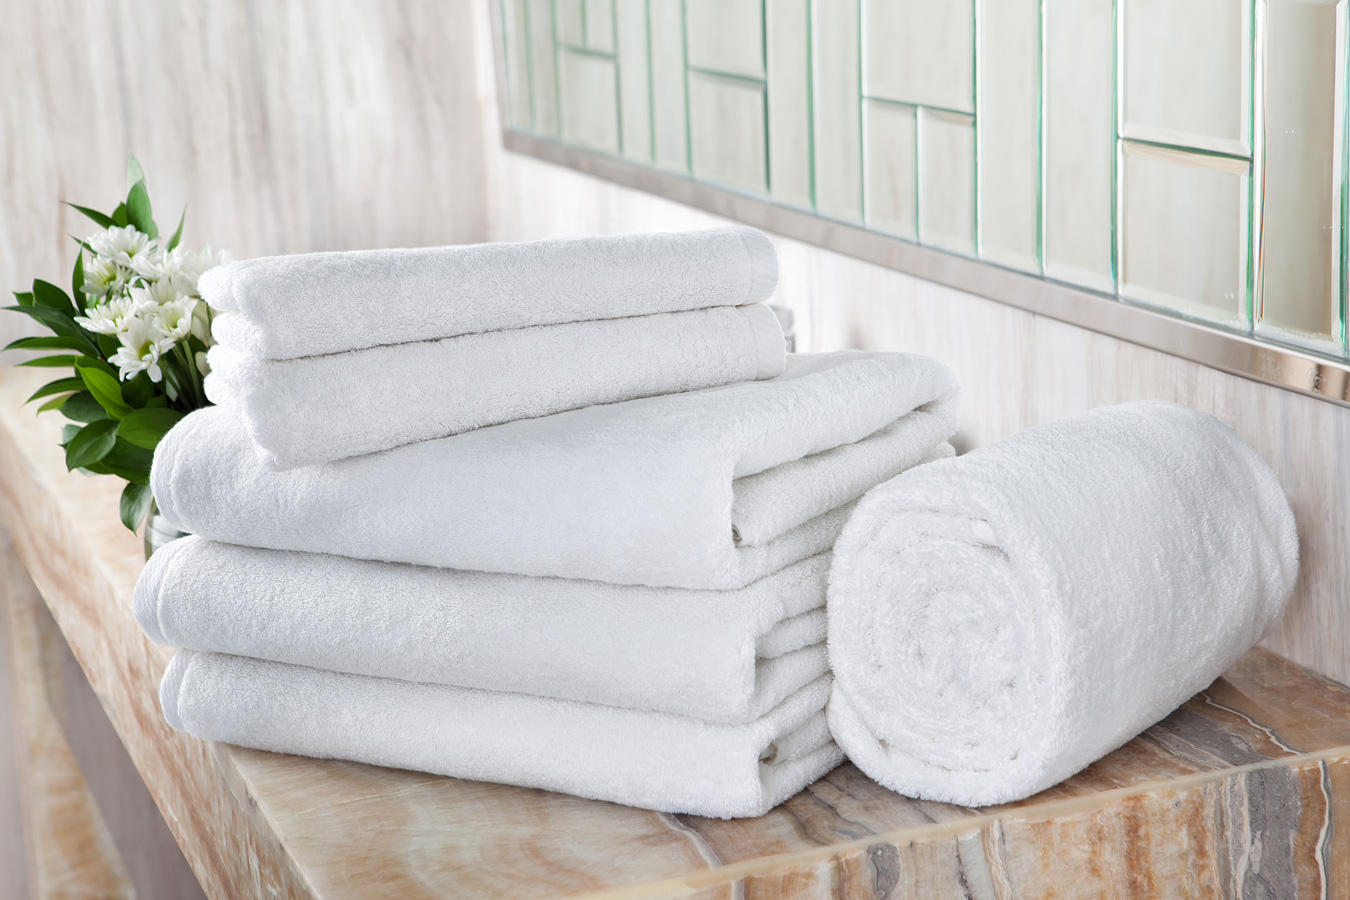 Hotel-Towel